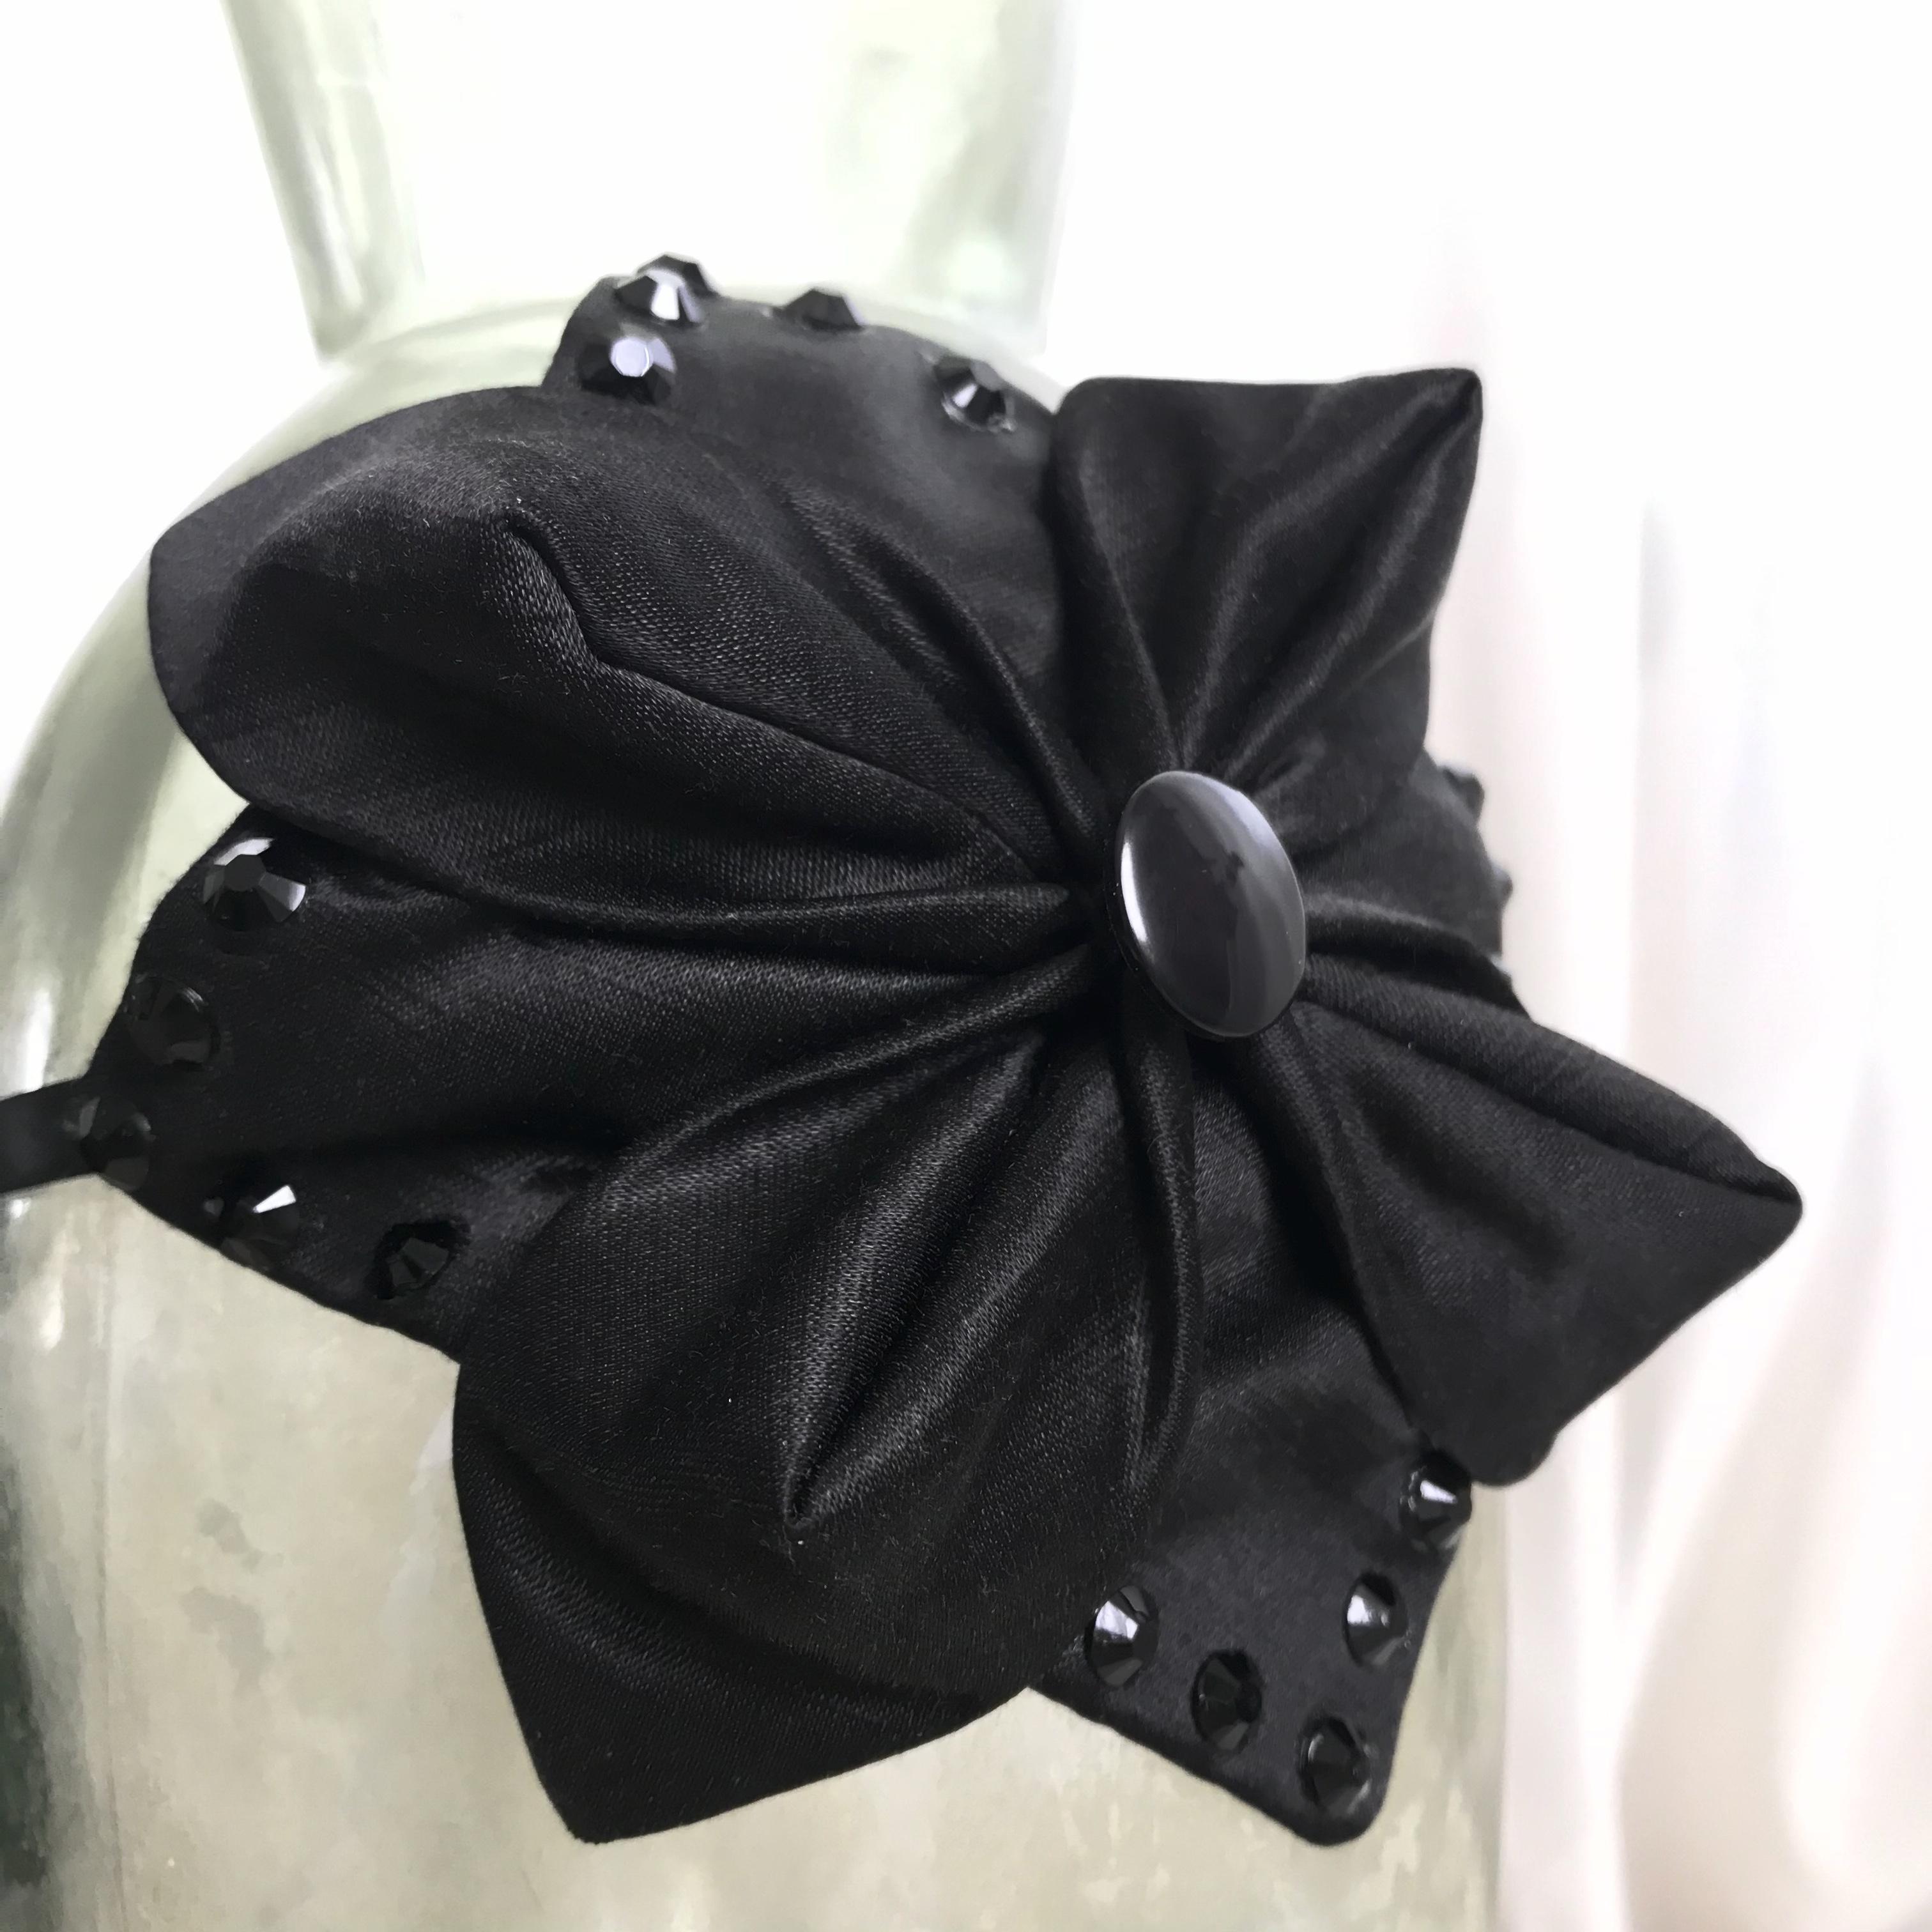 Tyra Therman: Origami-panta, musta satiini strasseilla, ALE